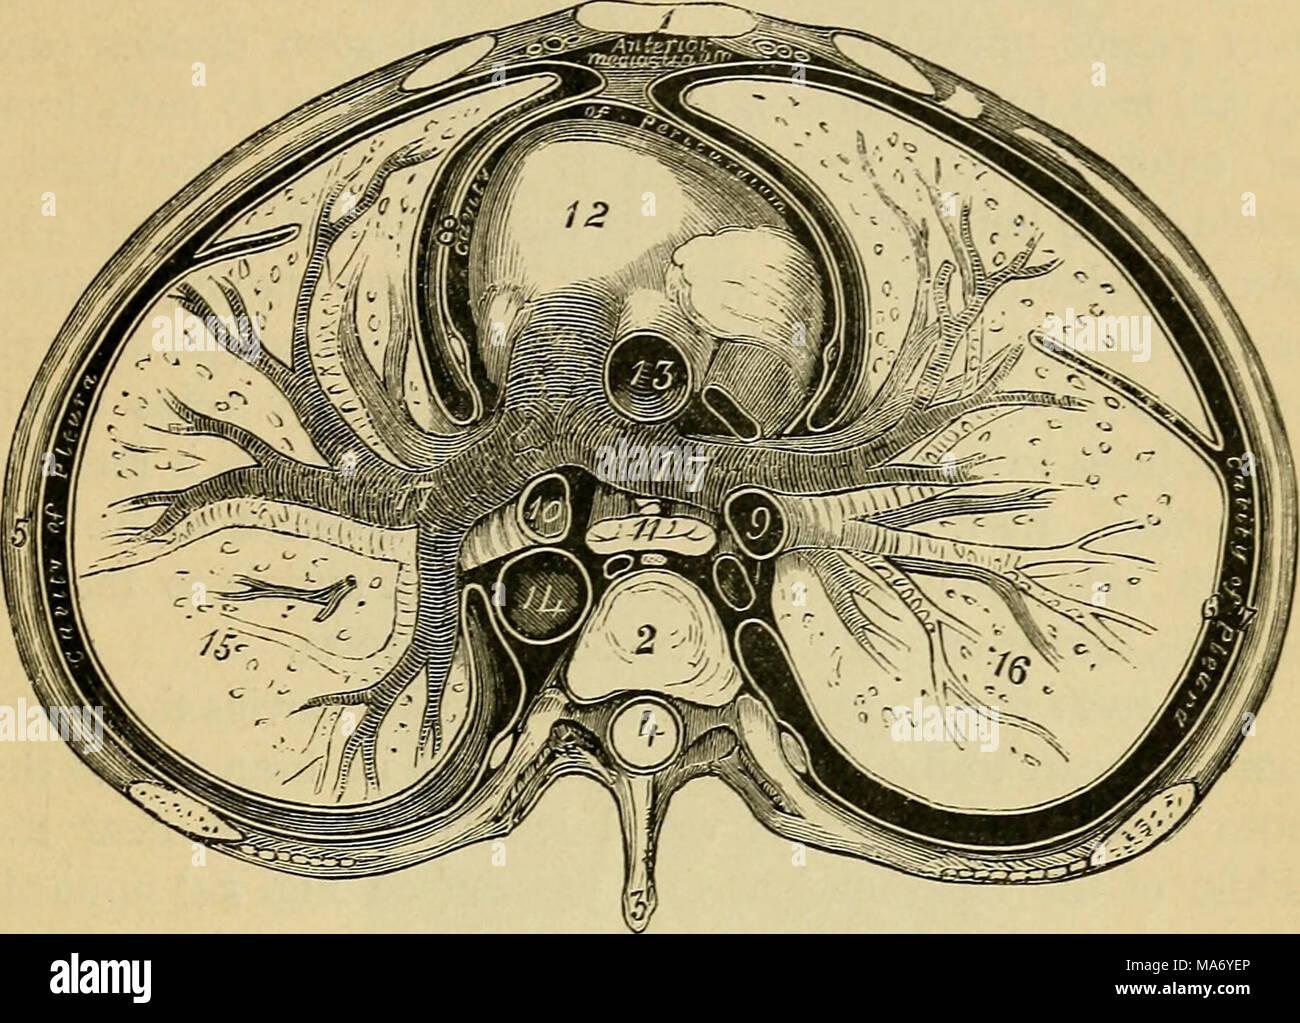 Elementare Physiologie. Fjg. 53. - Querschnitt durch den Thorax. Der ...